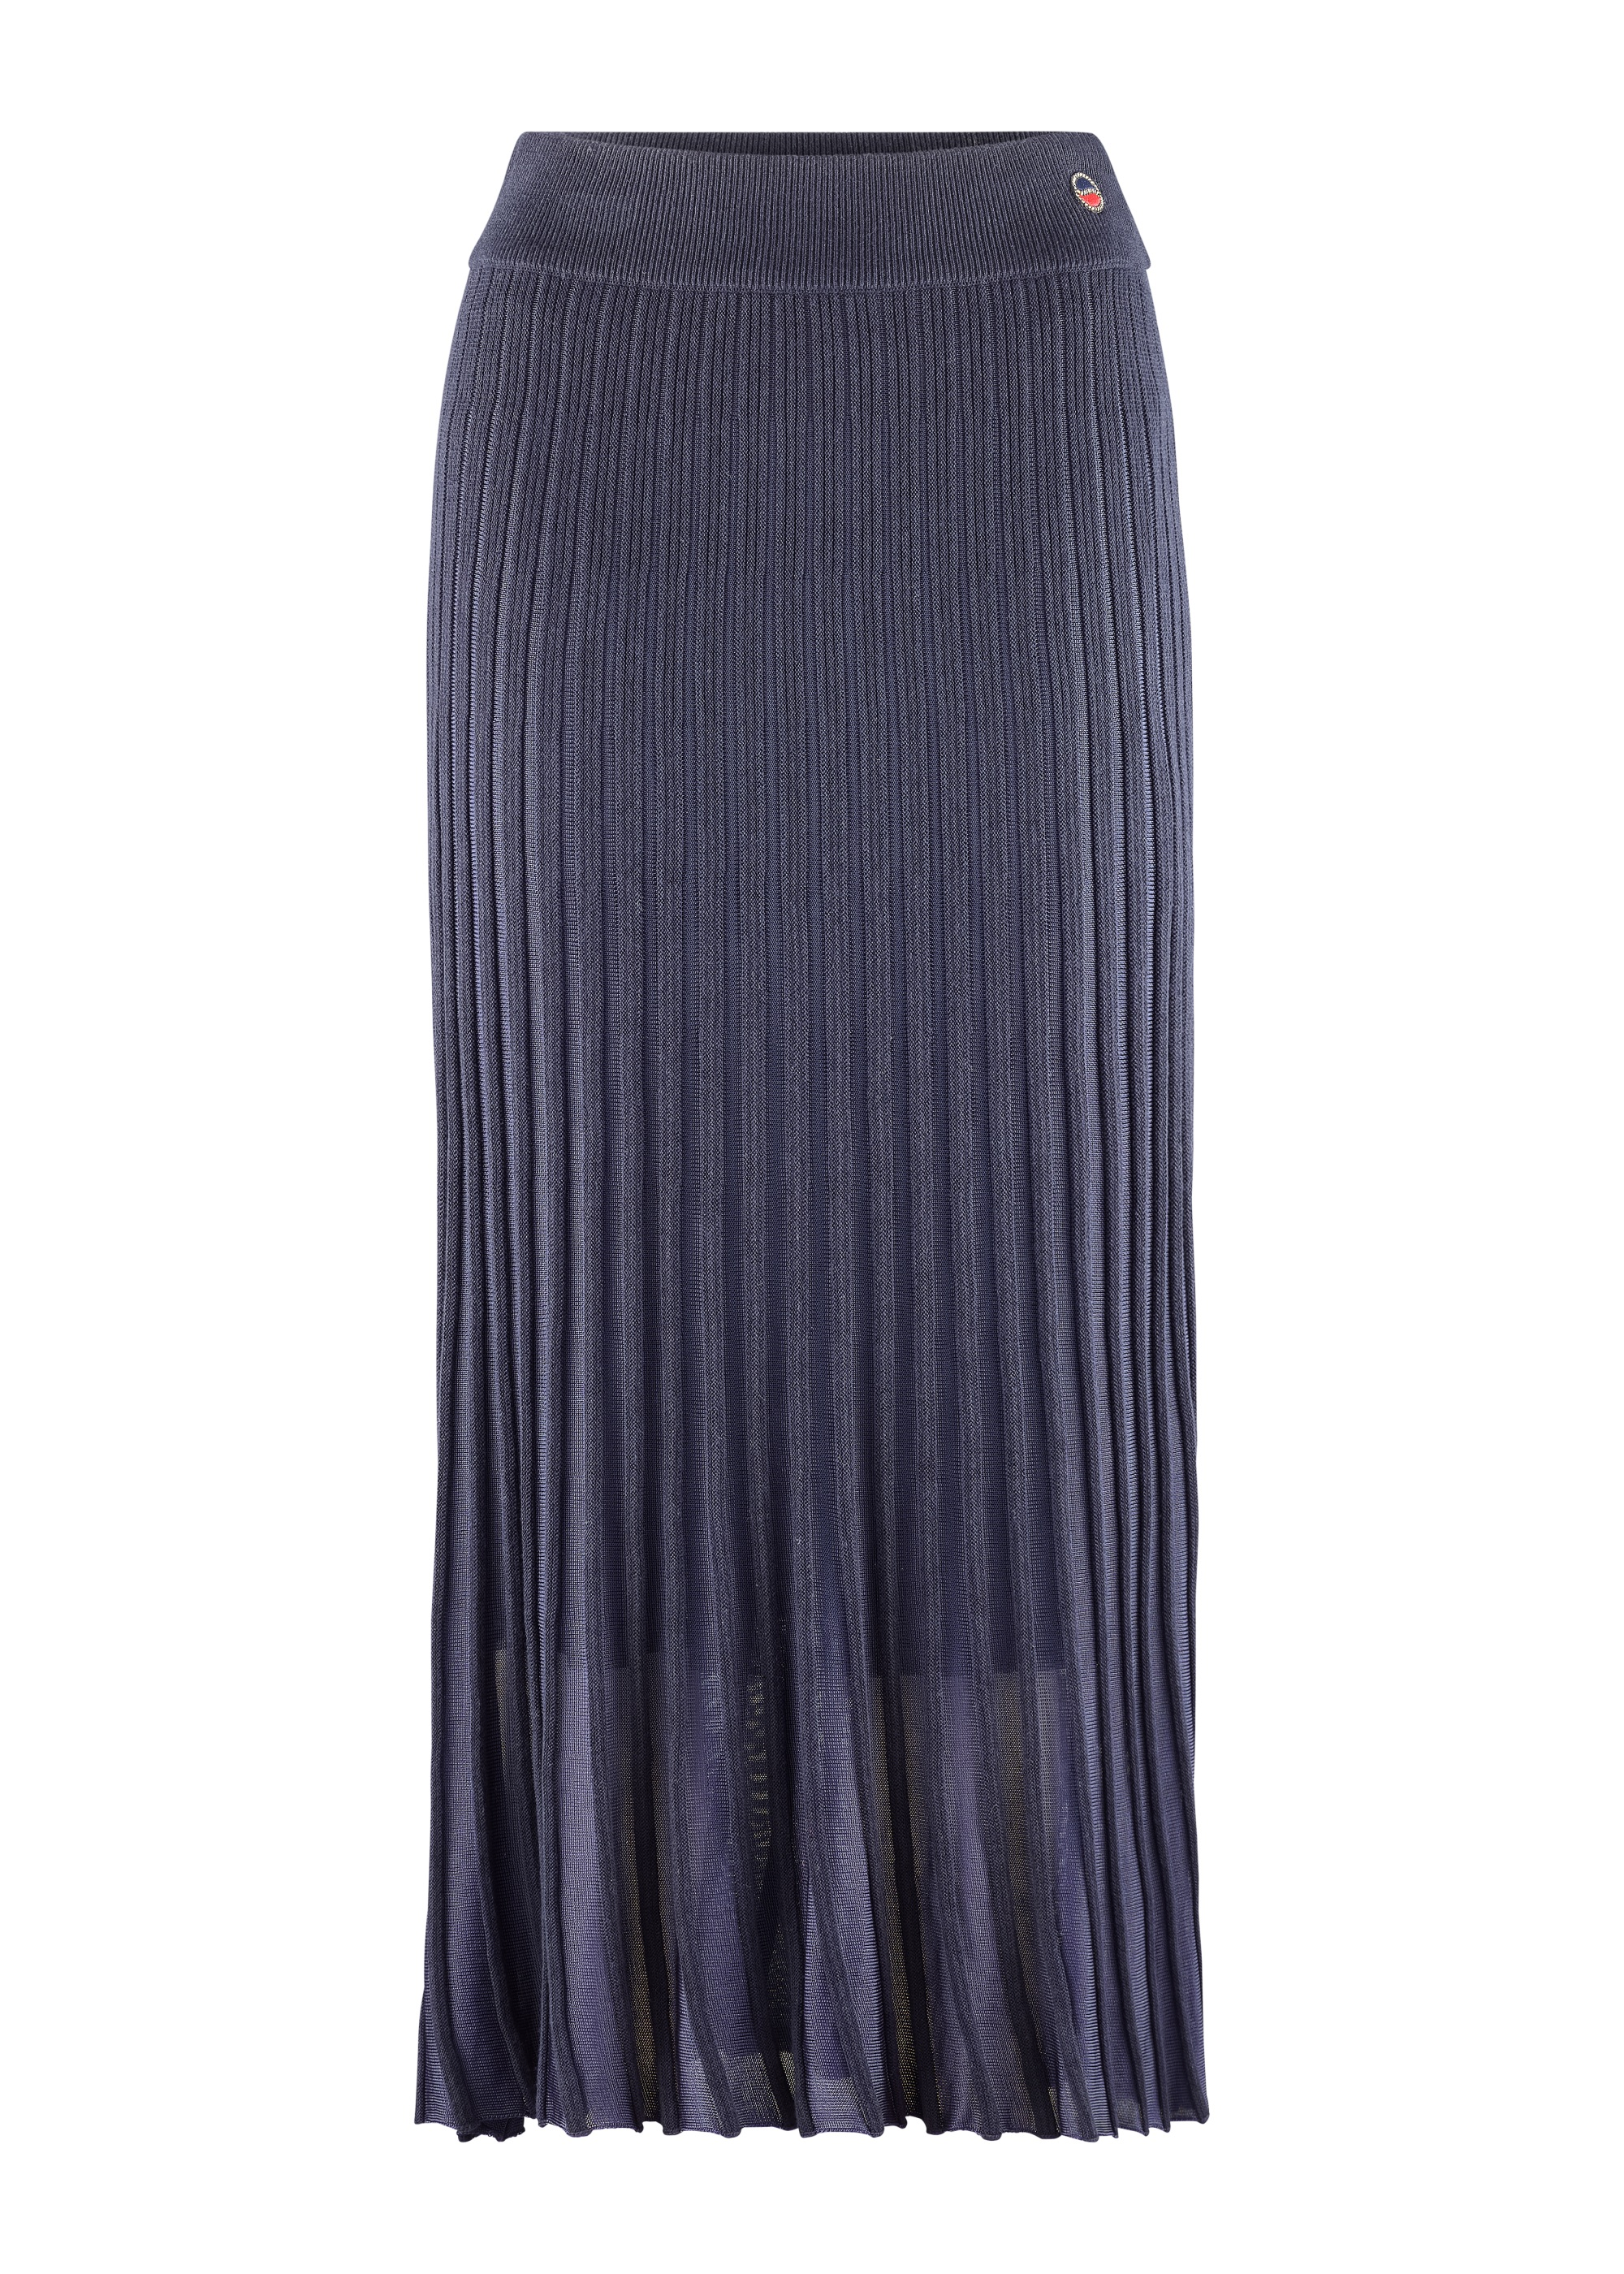 Callac Skirt Marine-1